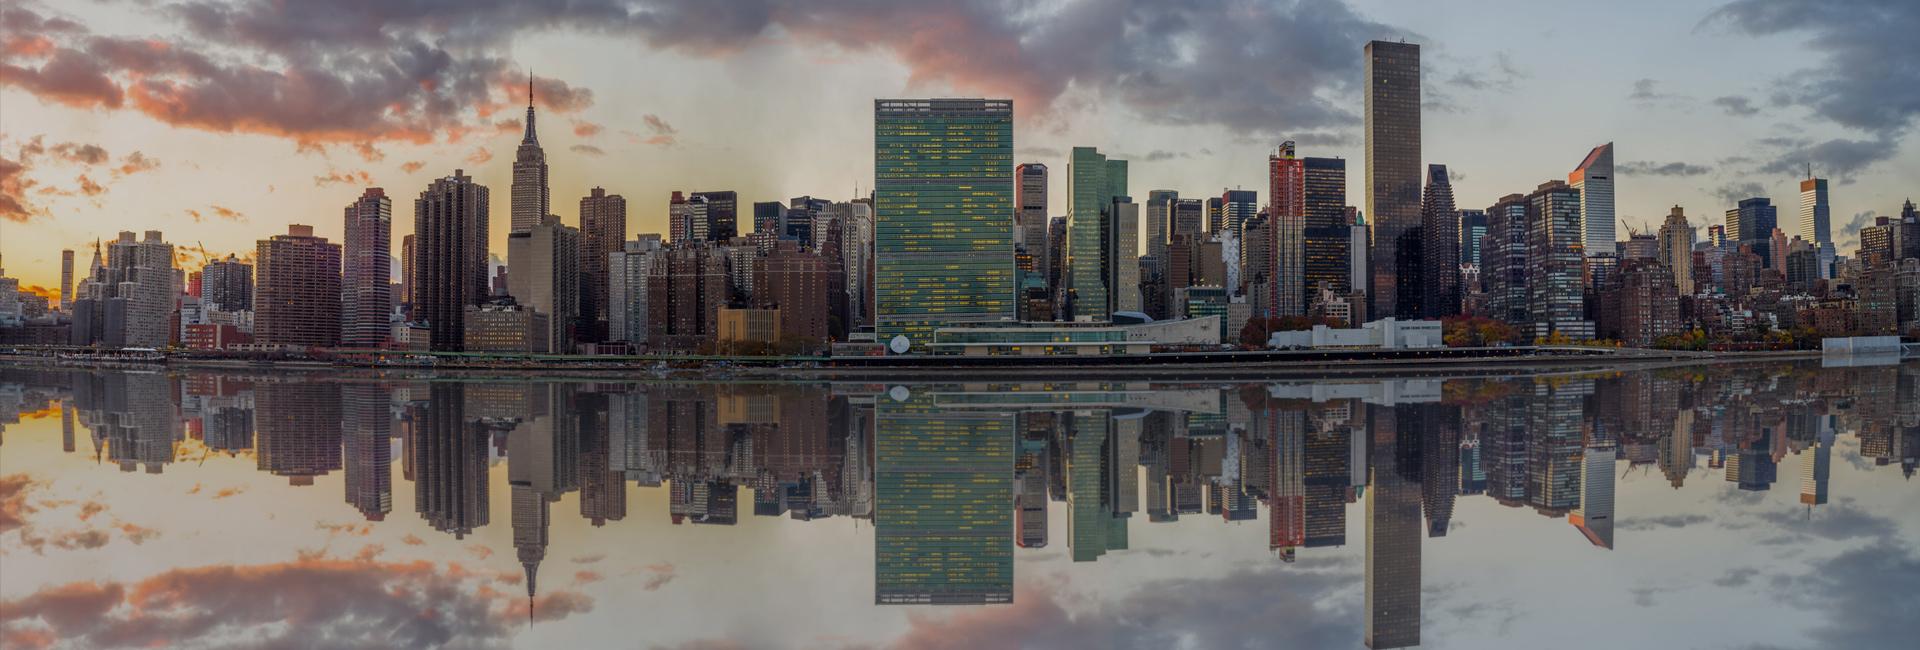 Reflection of City Skyline New York